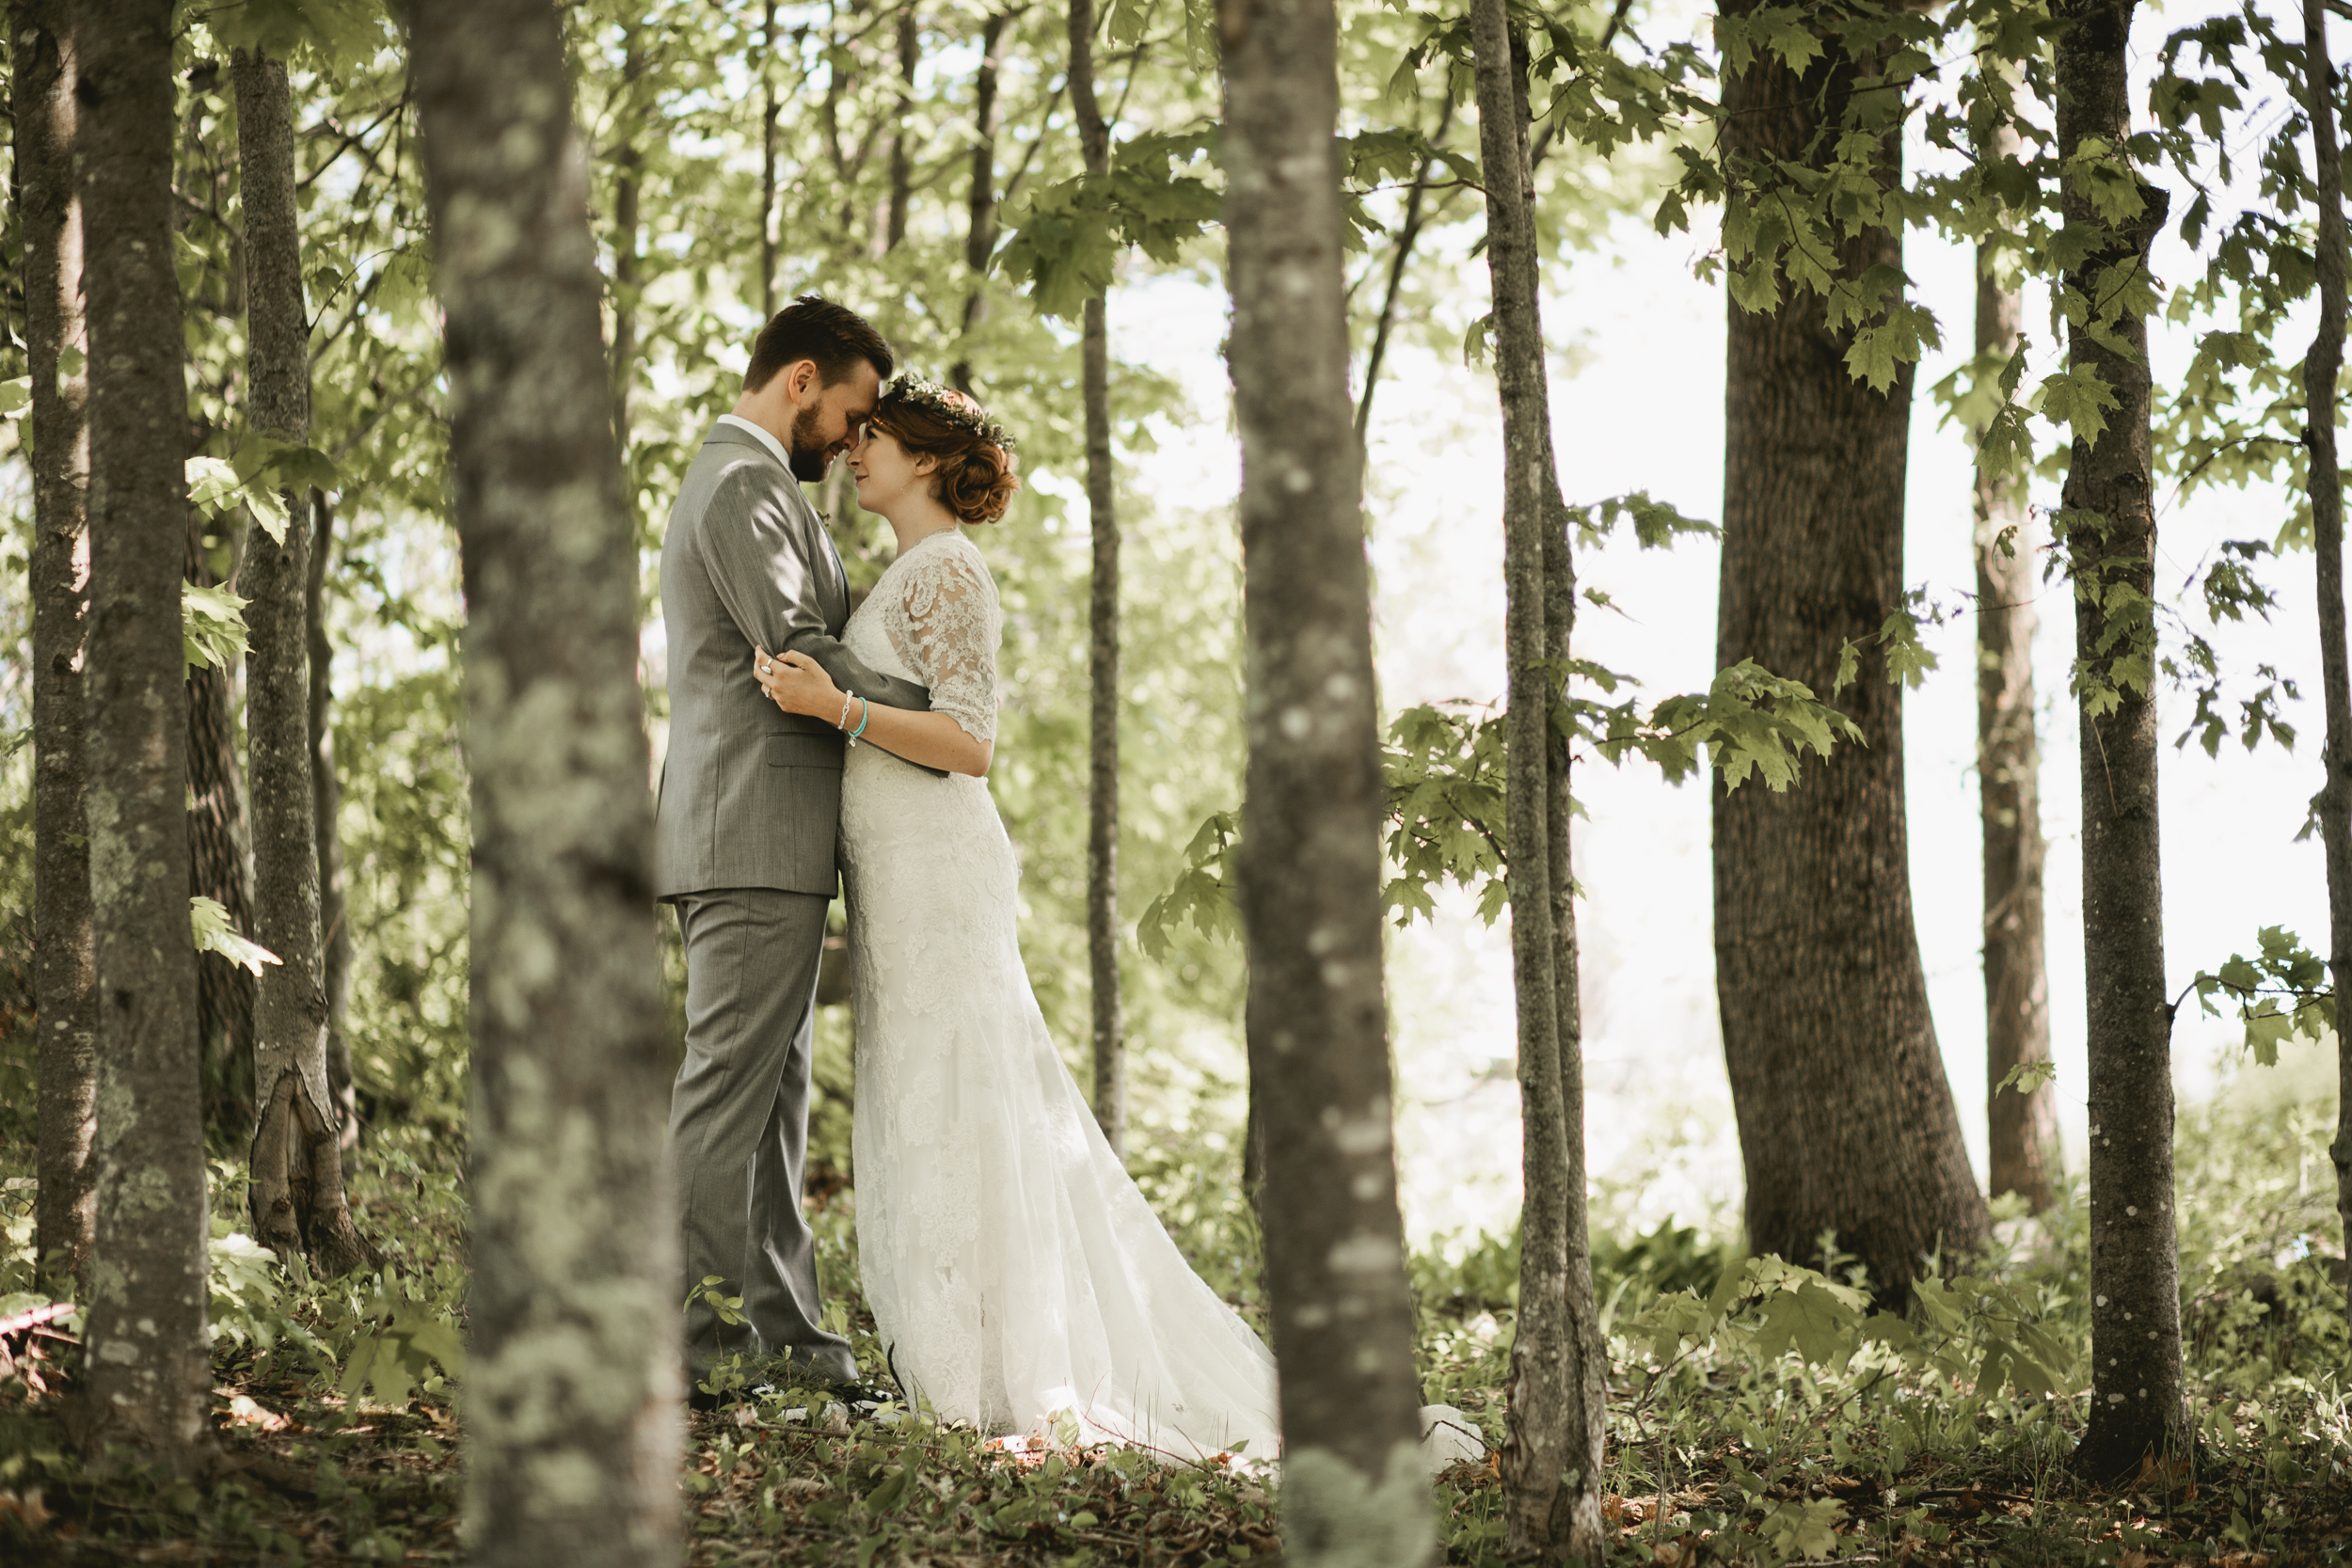 Spring-Meadows-Maine-Wedding-117.jpg